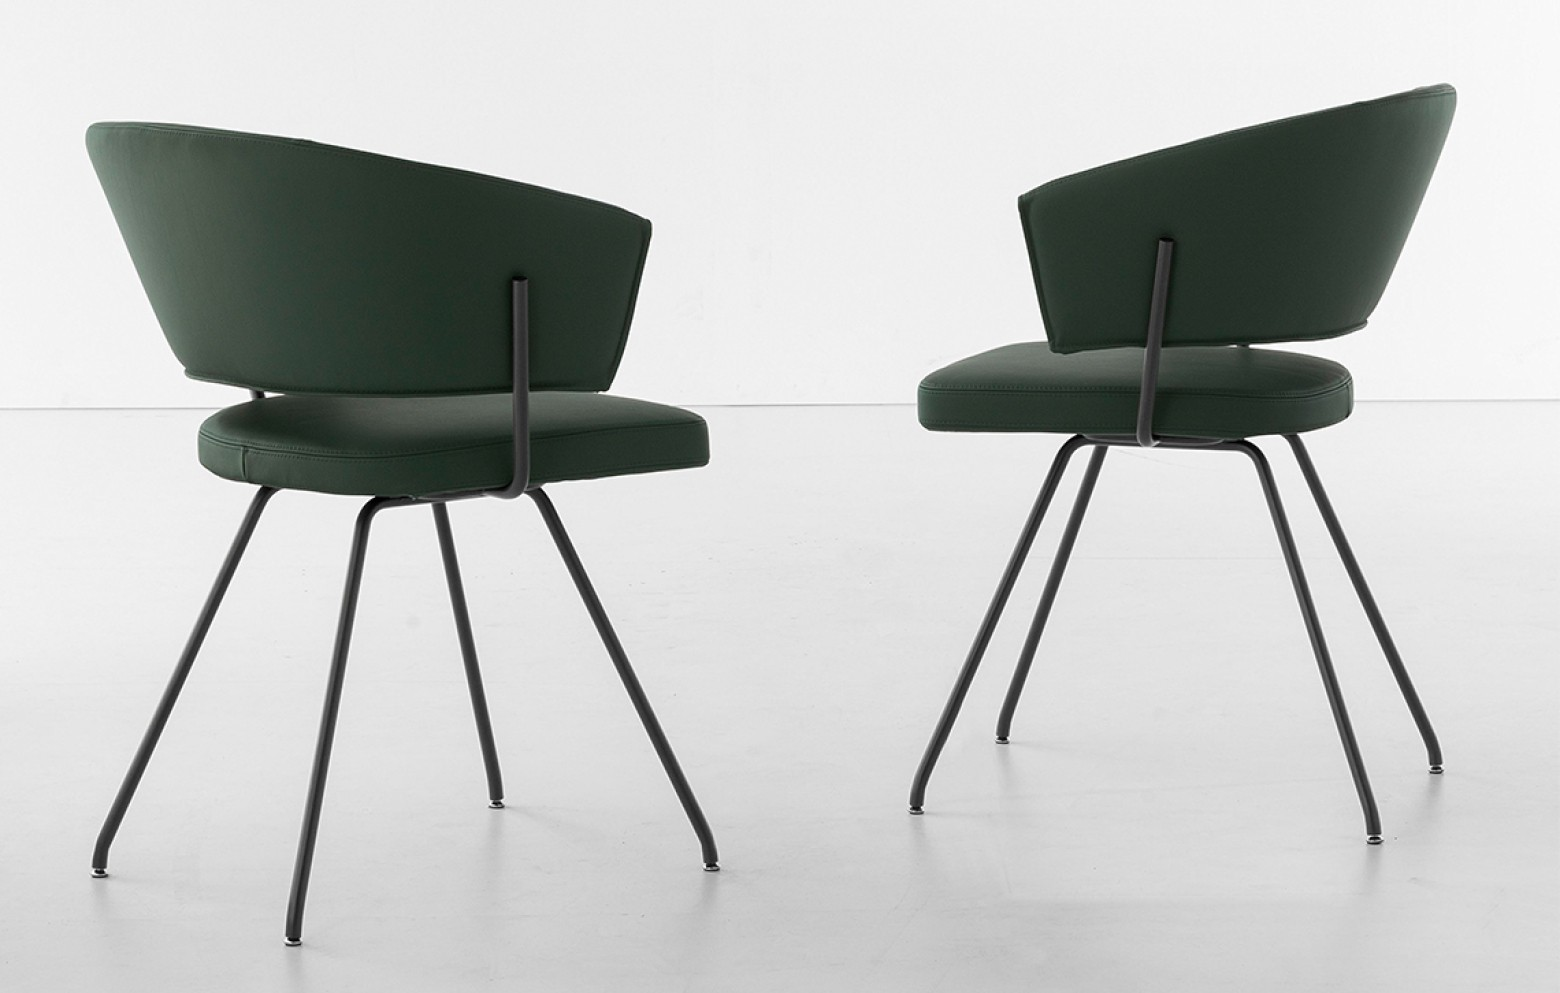 Bahia Leder Stuhl Stuhle Tische Stuhle Who S Perfect